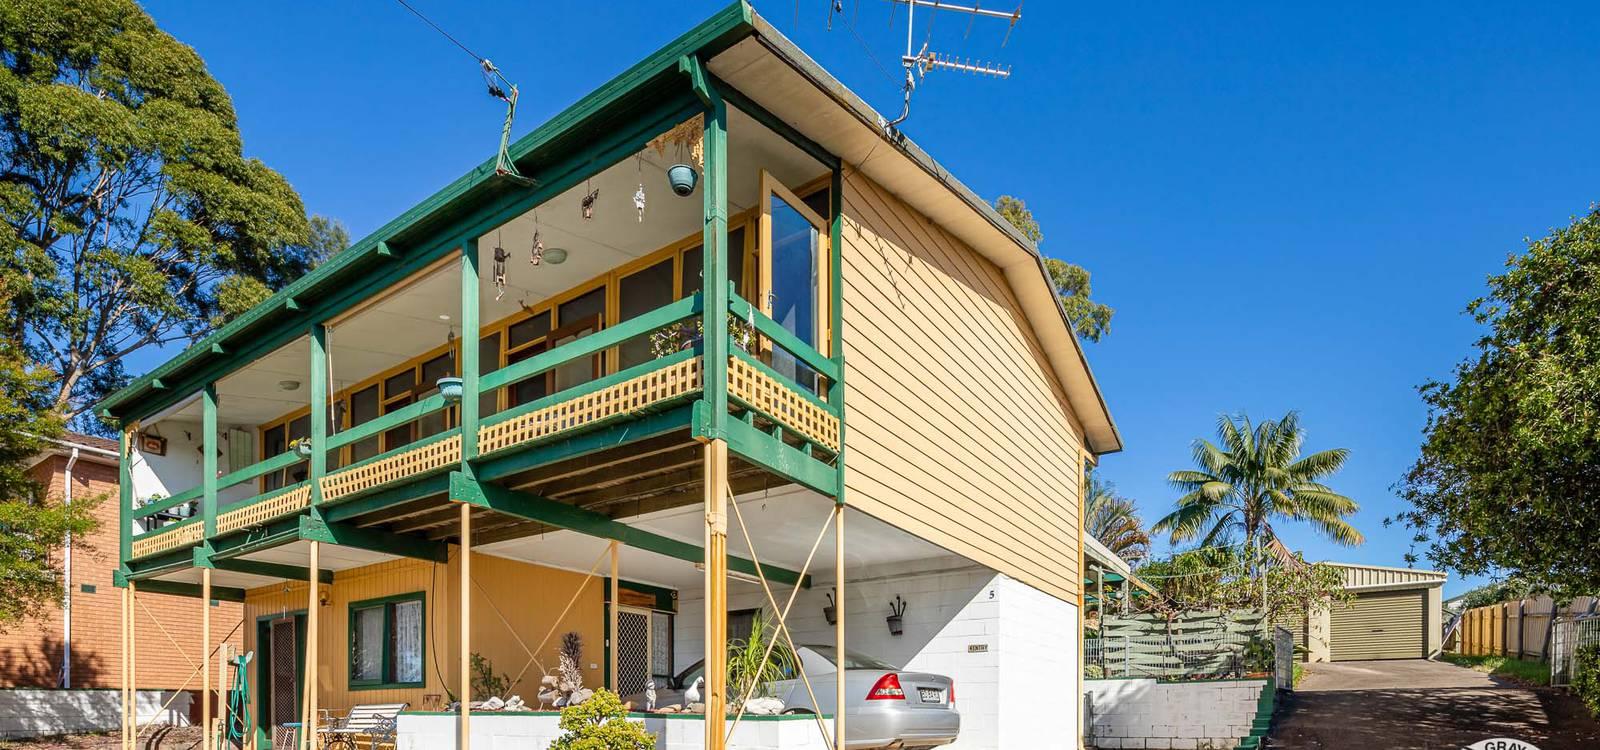 5 Gundary Street MORUYA, NSW 2537 - photo 1